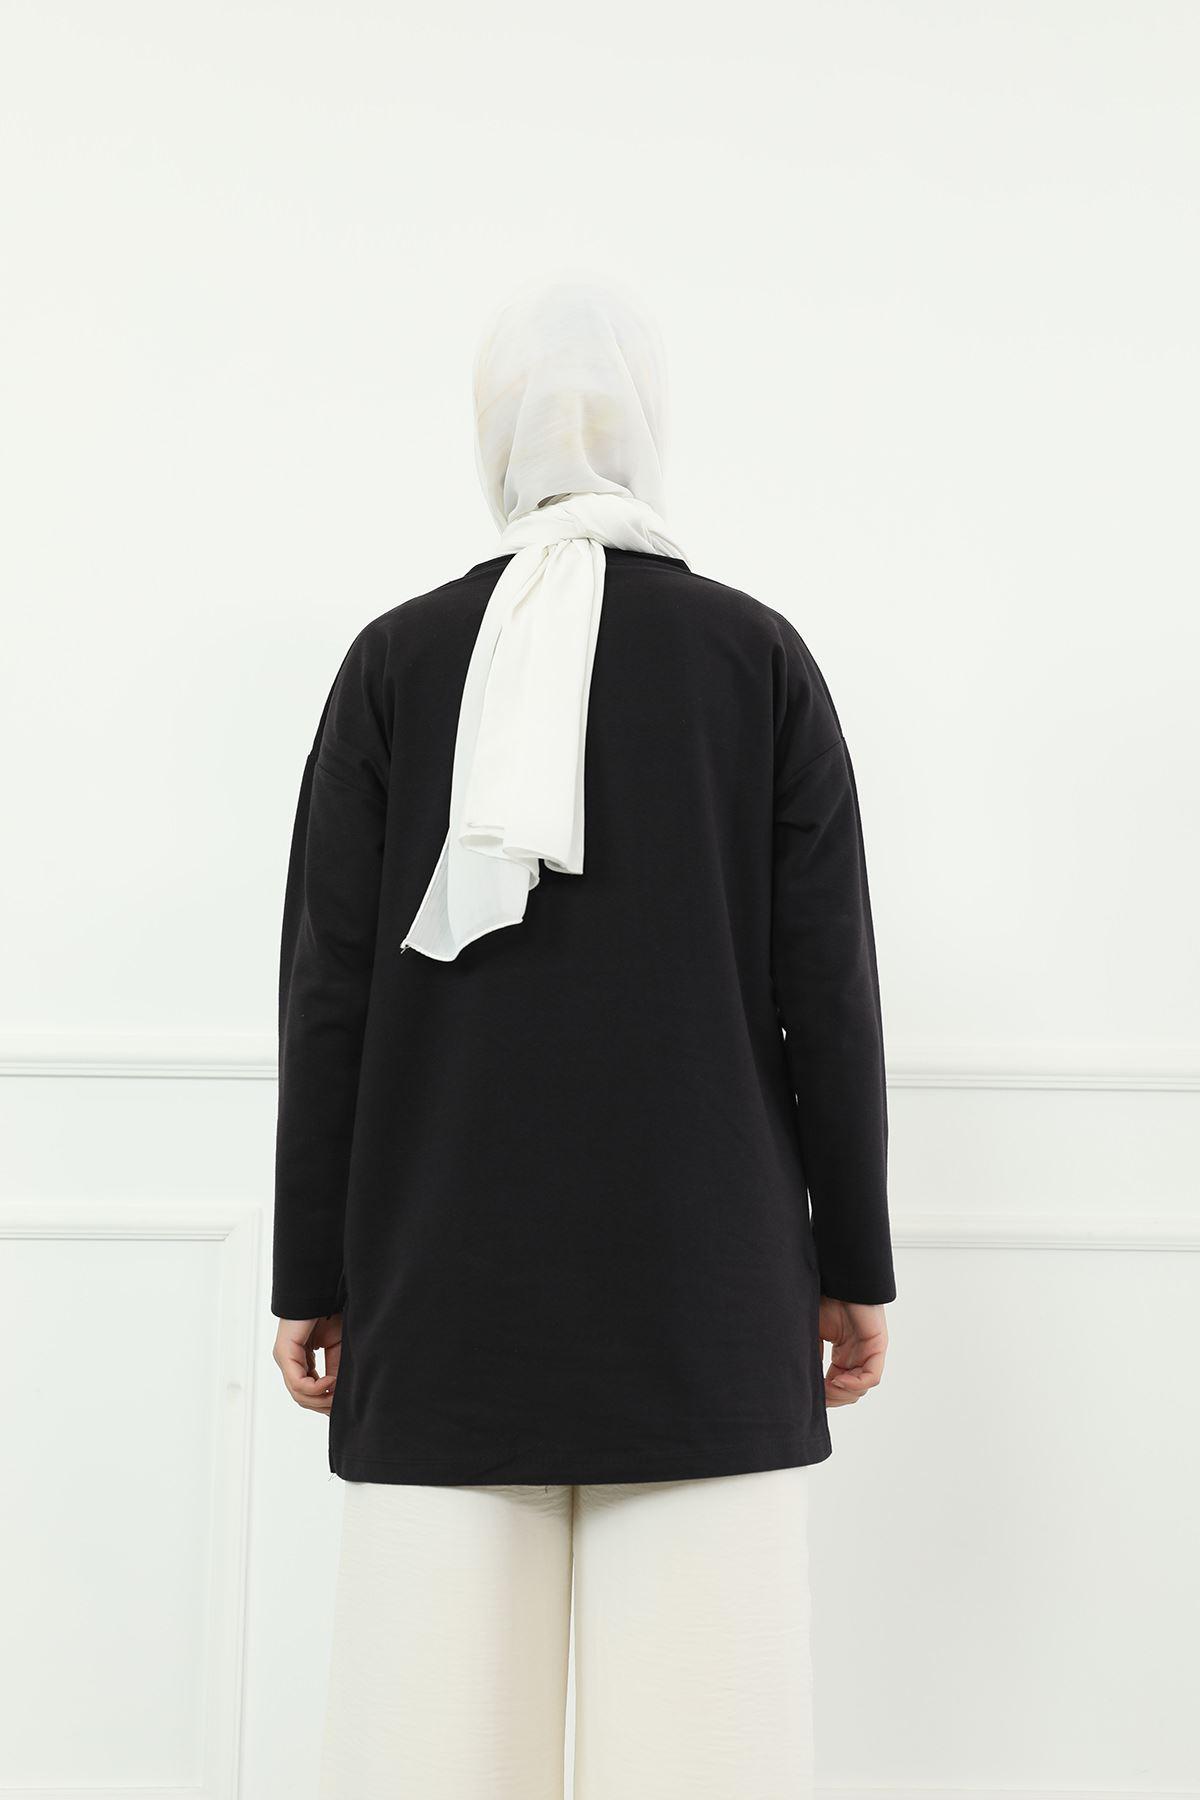 Baskılı Sweatshirt-Siyah